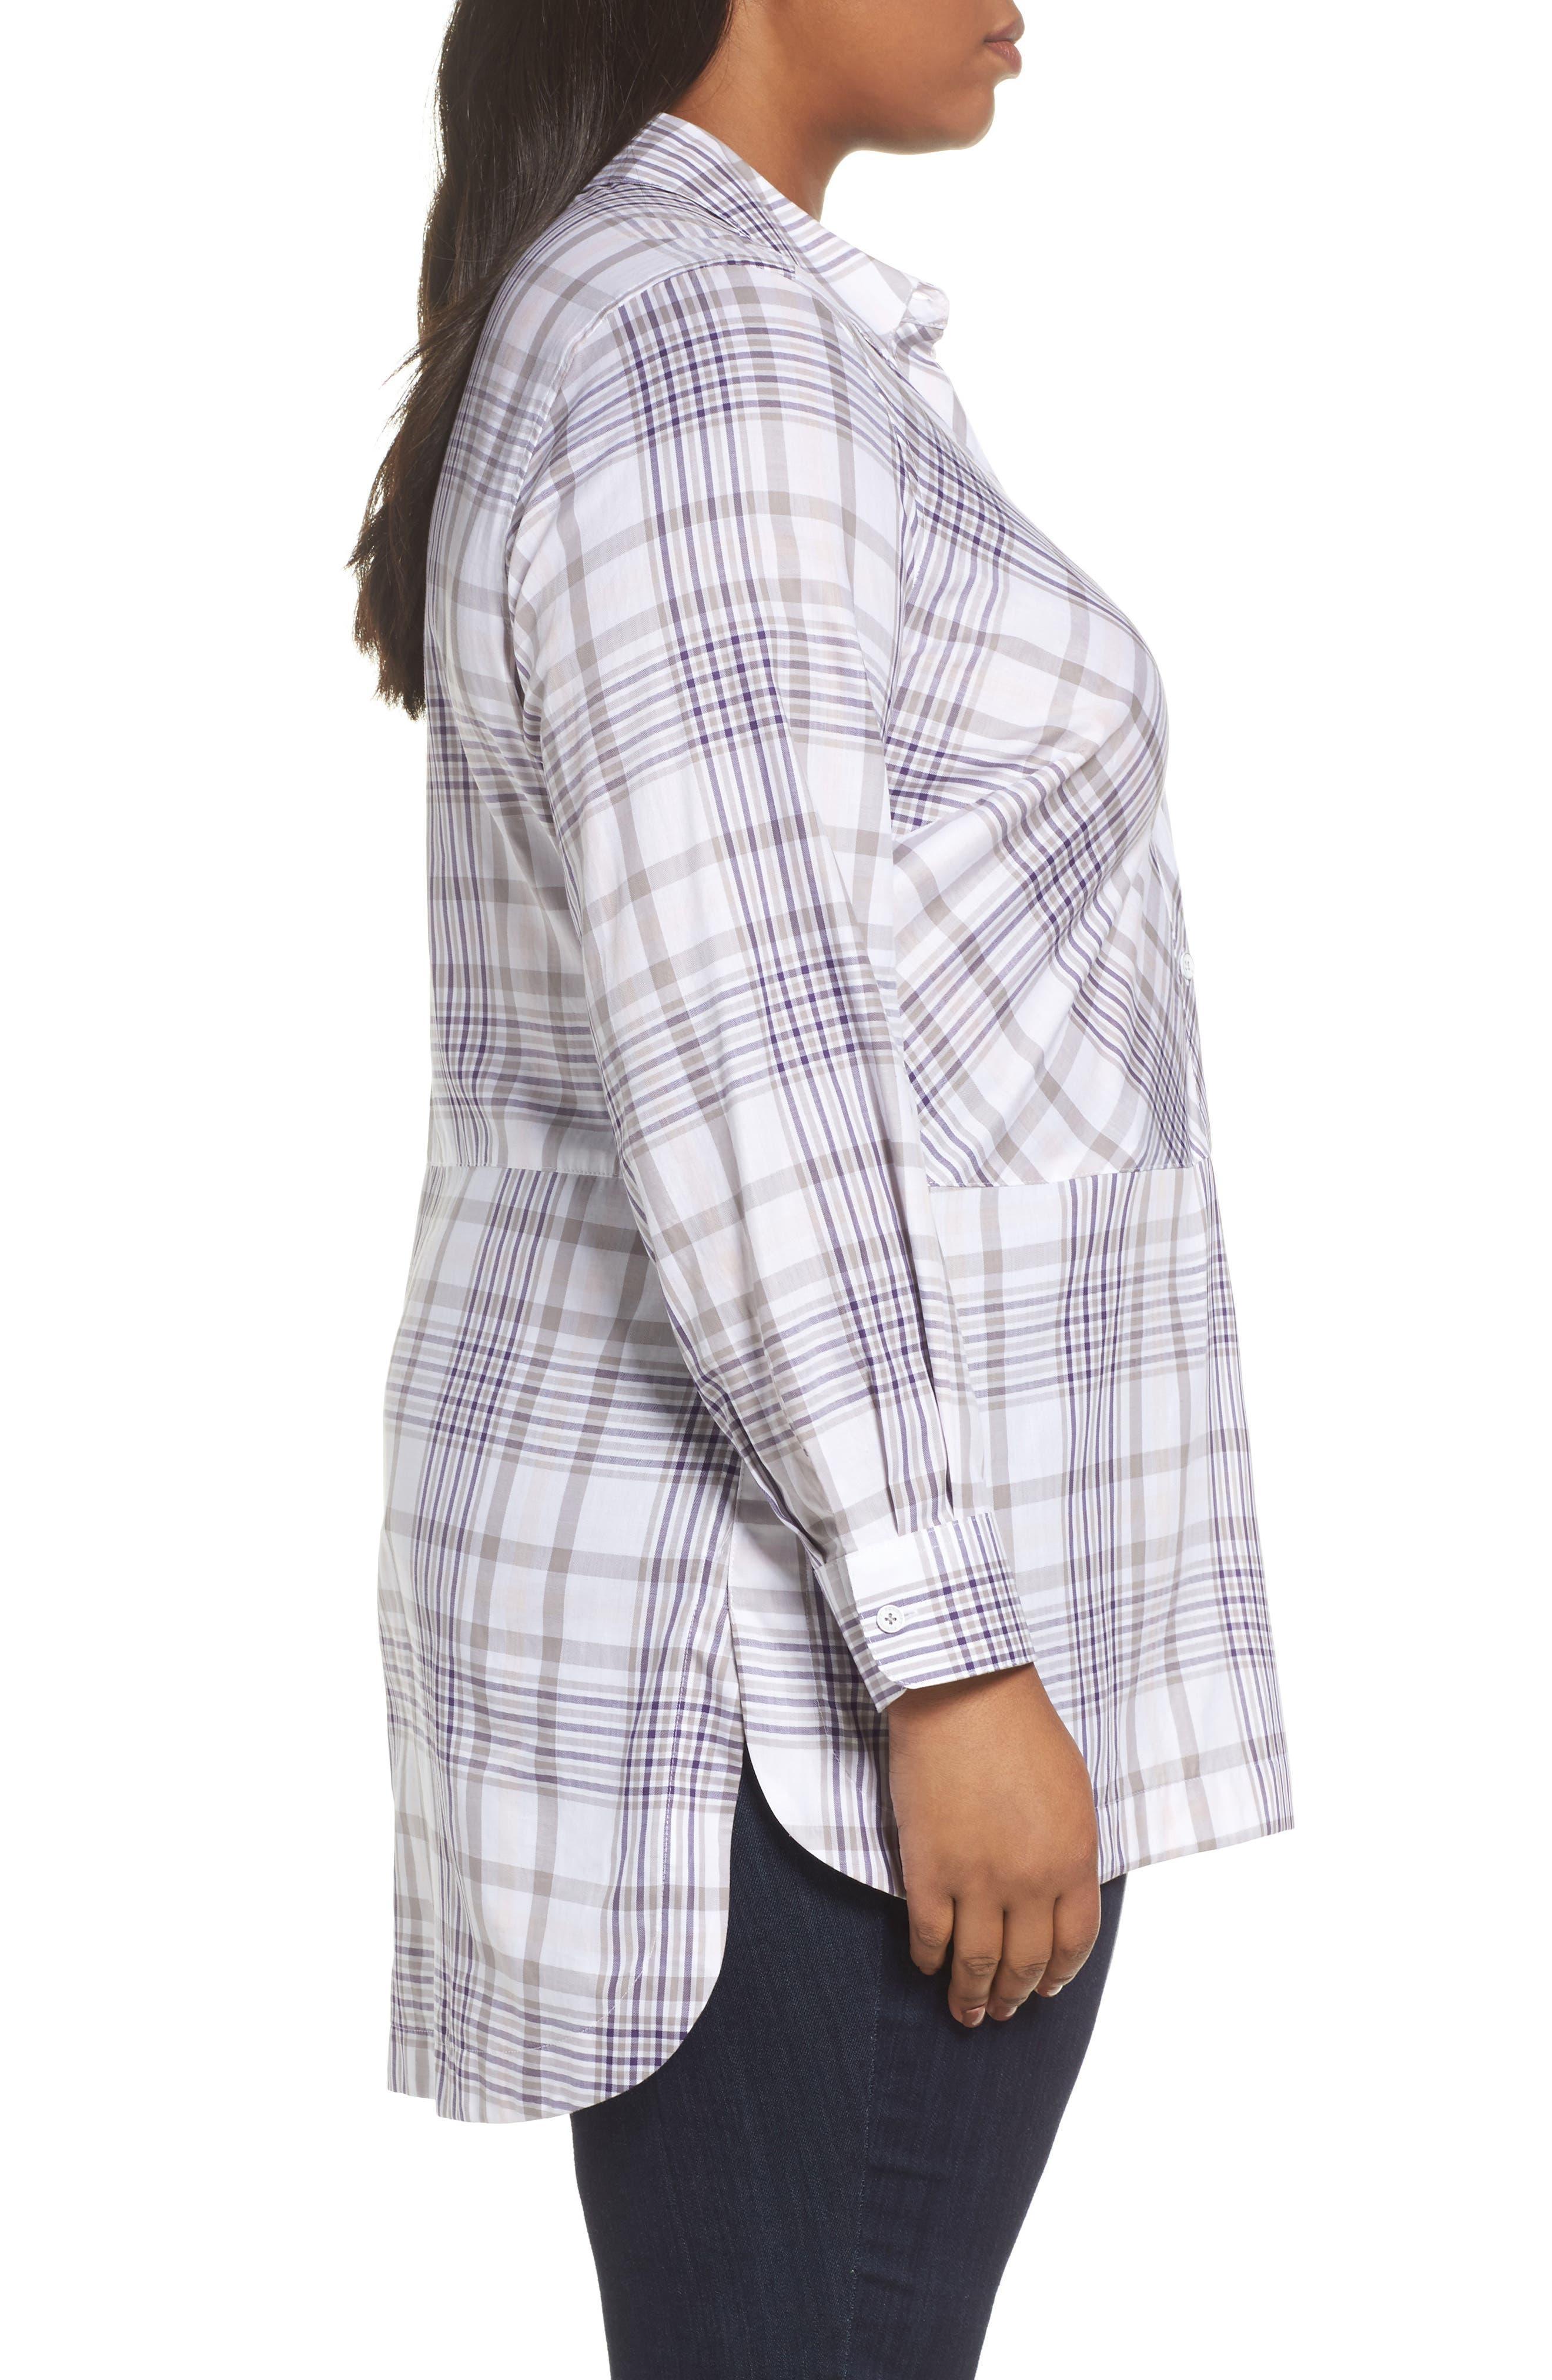 Maddy Winter Plaid Shirt,                             Alternate thumbnail 3, color,                             037